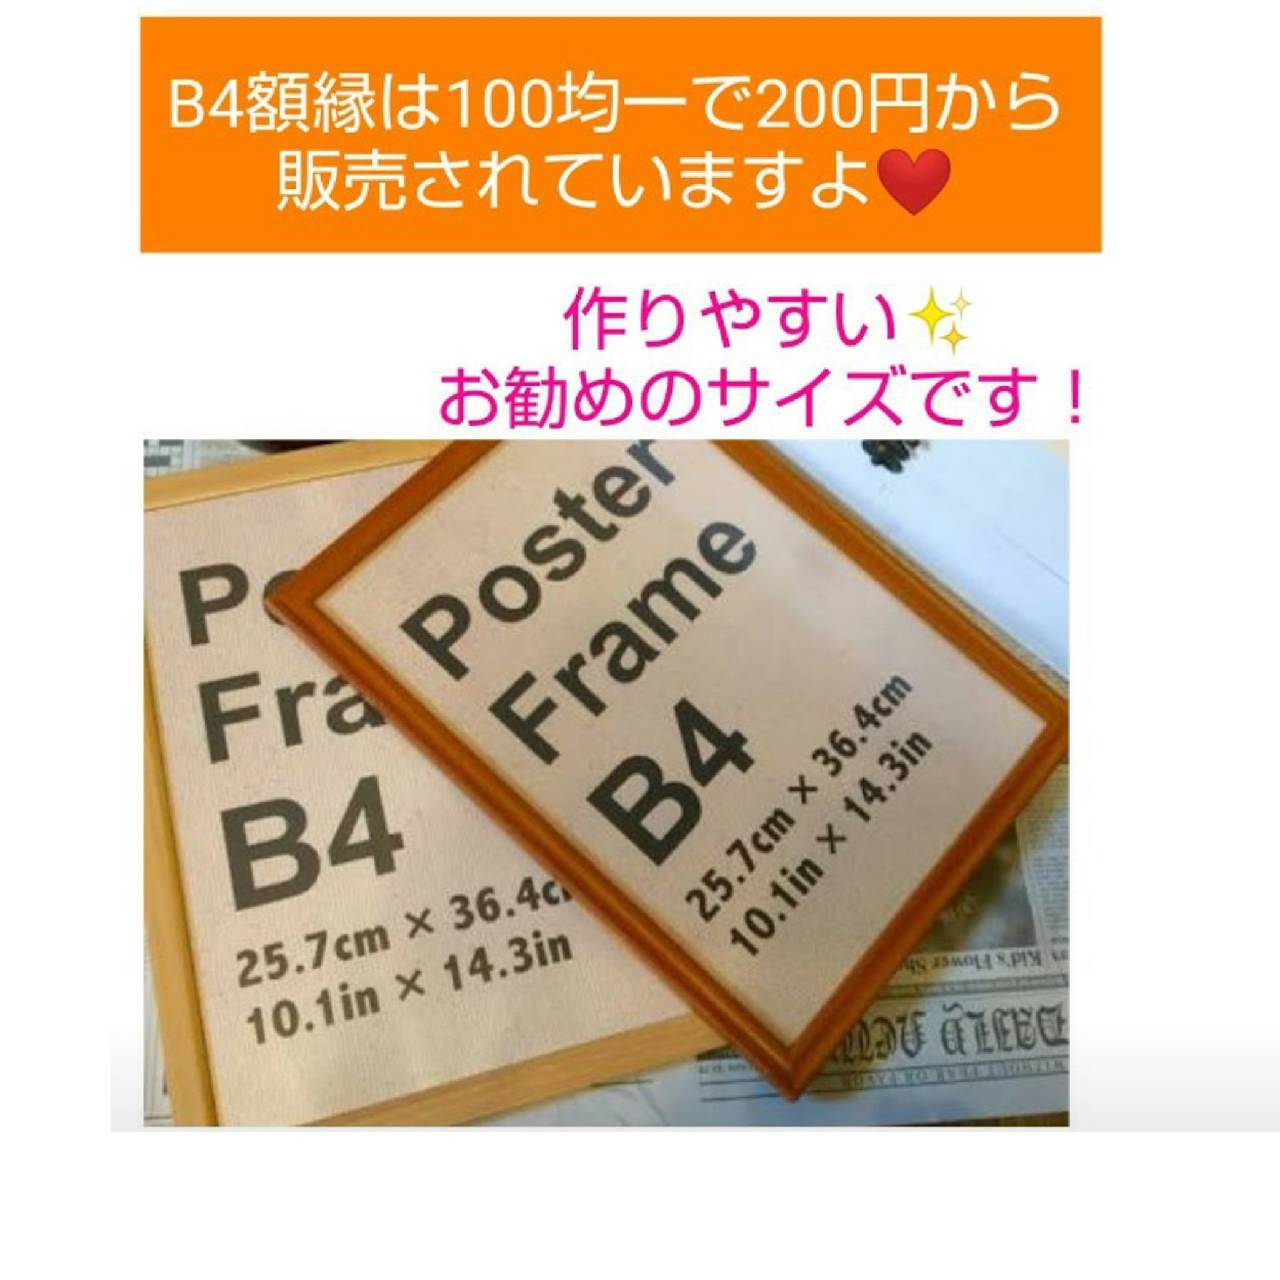 B4:四角【s8926】フルダイヤモンドアート✨